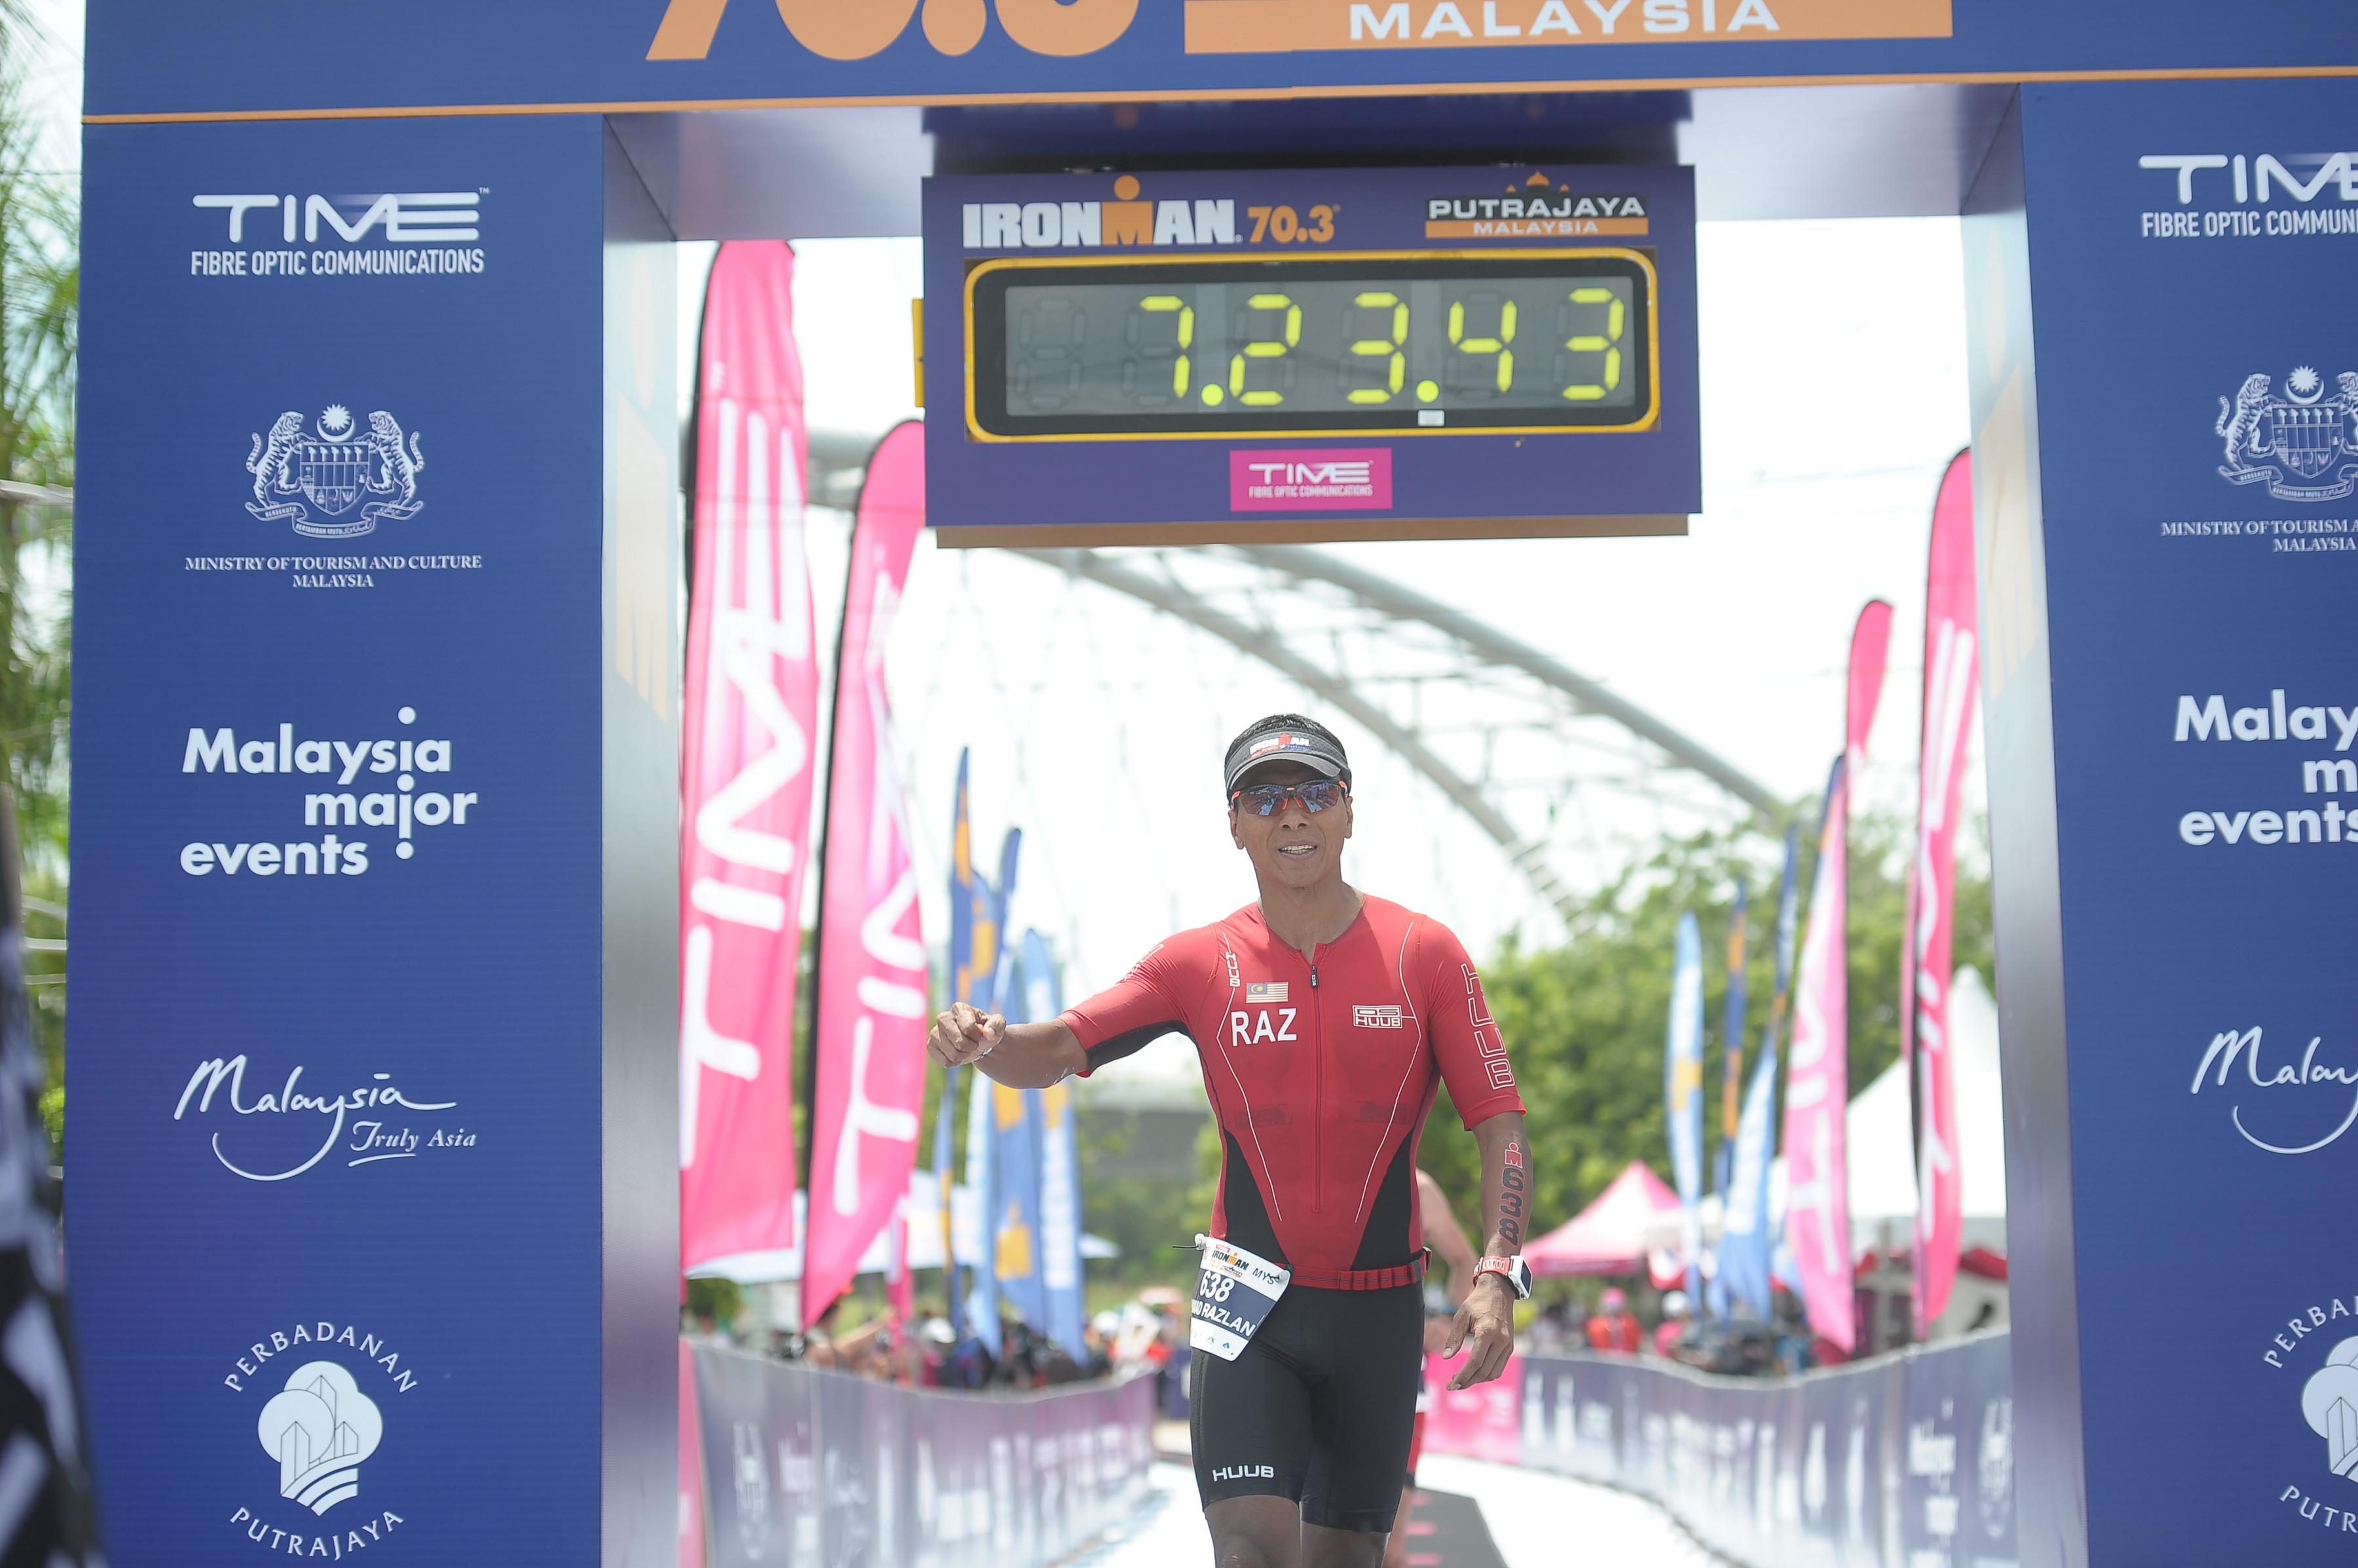 Dato Razlan Razali, CEO of Sepang International Circuit seeks a new challenge at the Ironman Malaysia this November. (FinisherPix)